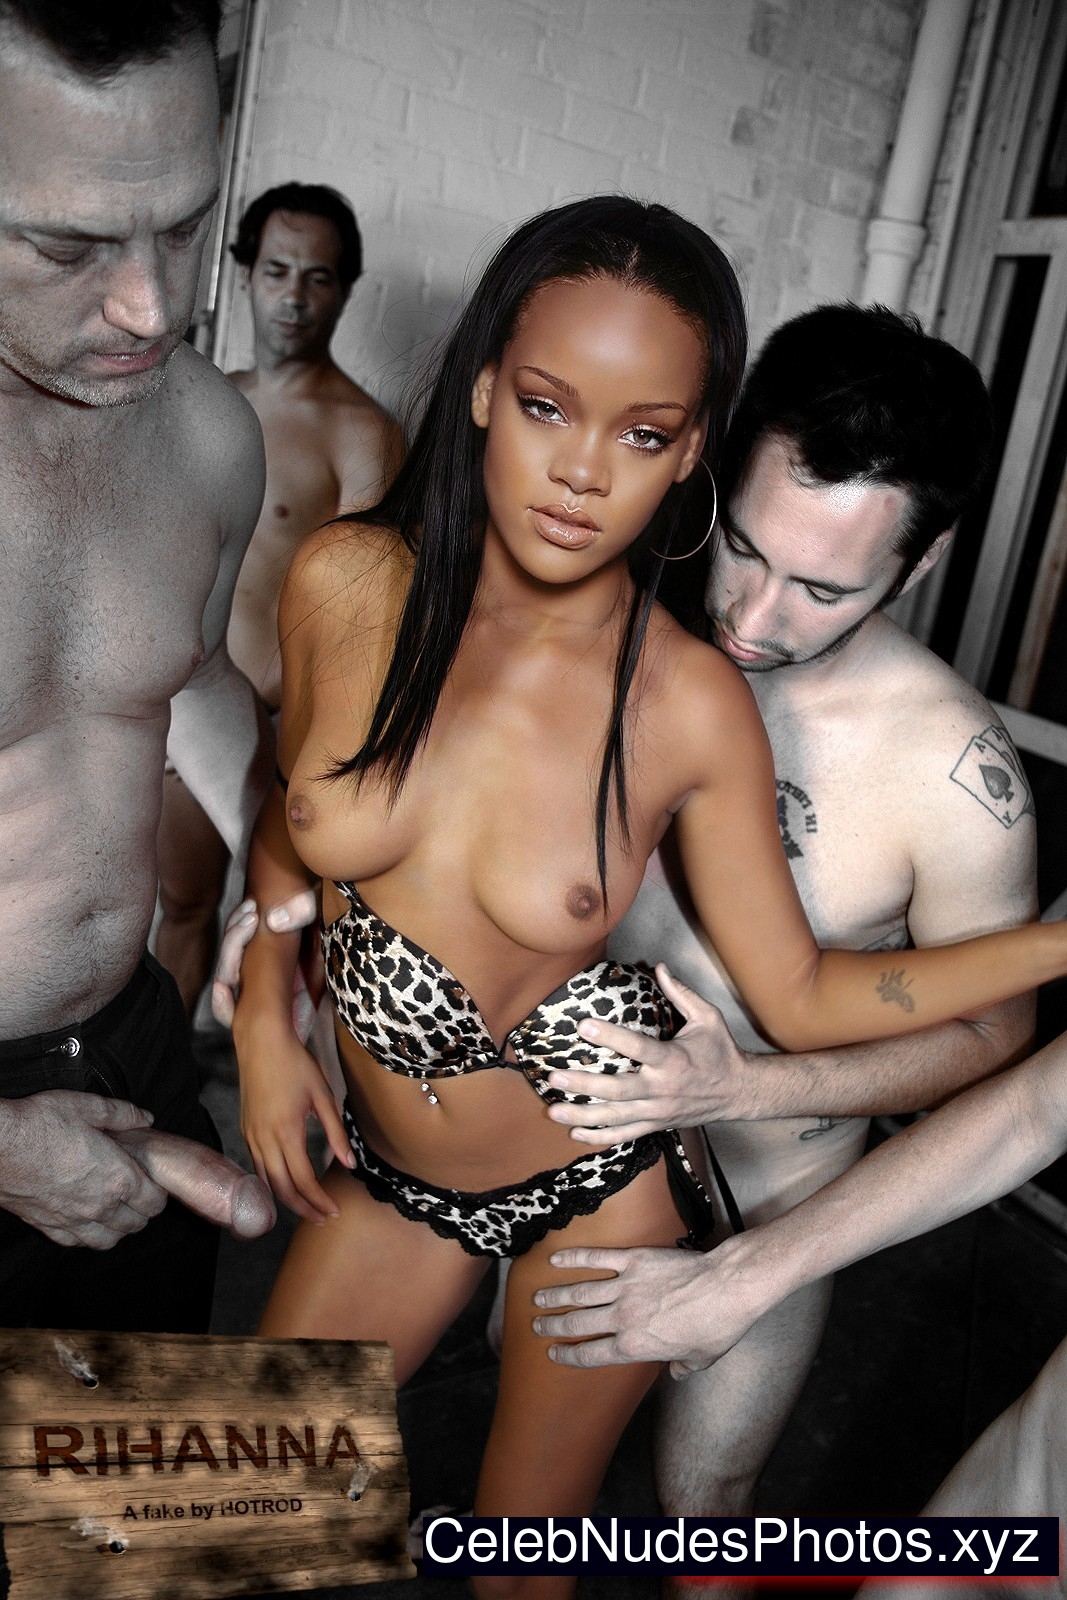 Rihanna Celebrity Nude Pic sexy 5